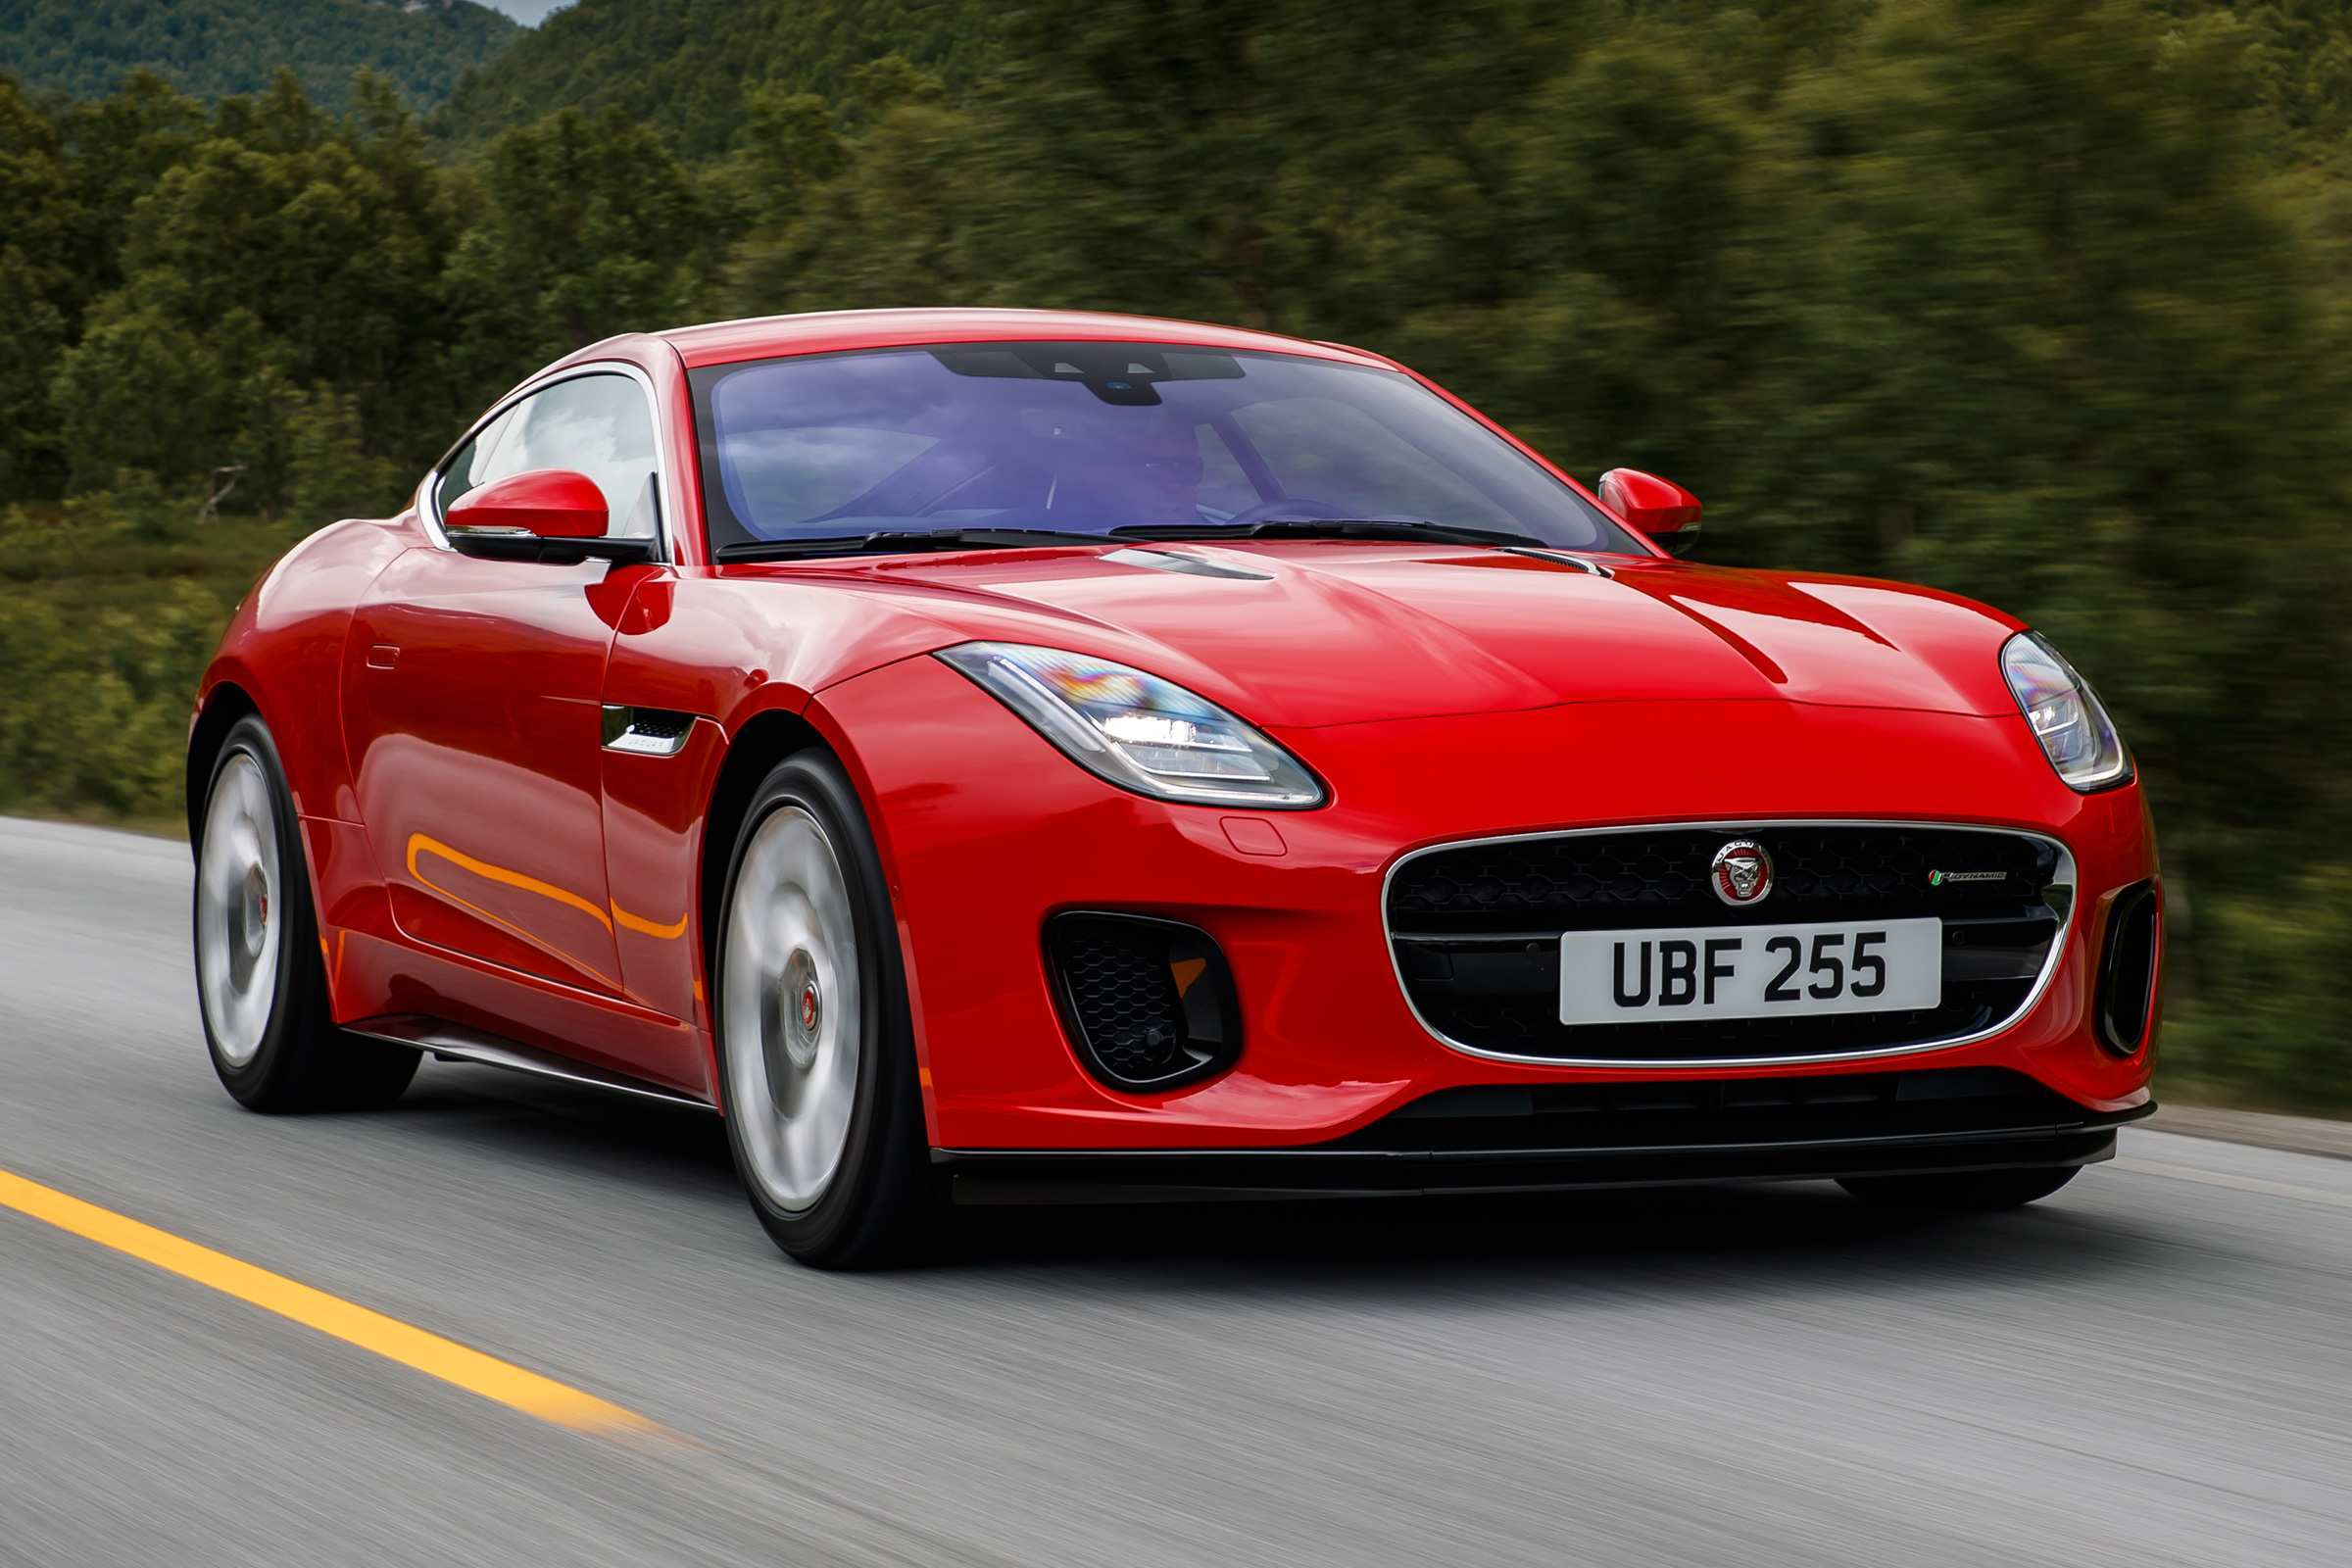 80 Best Review The Jaguar F Type Facelift 2019 New Engine Style with The Jaguar F Type Facelift 2019 New Engine